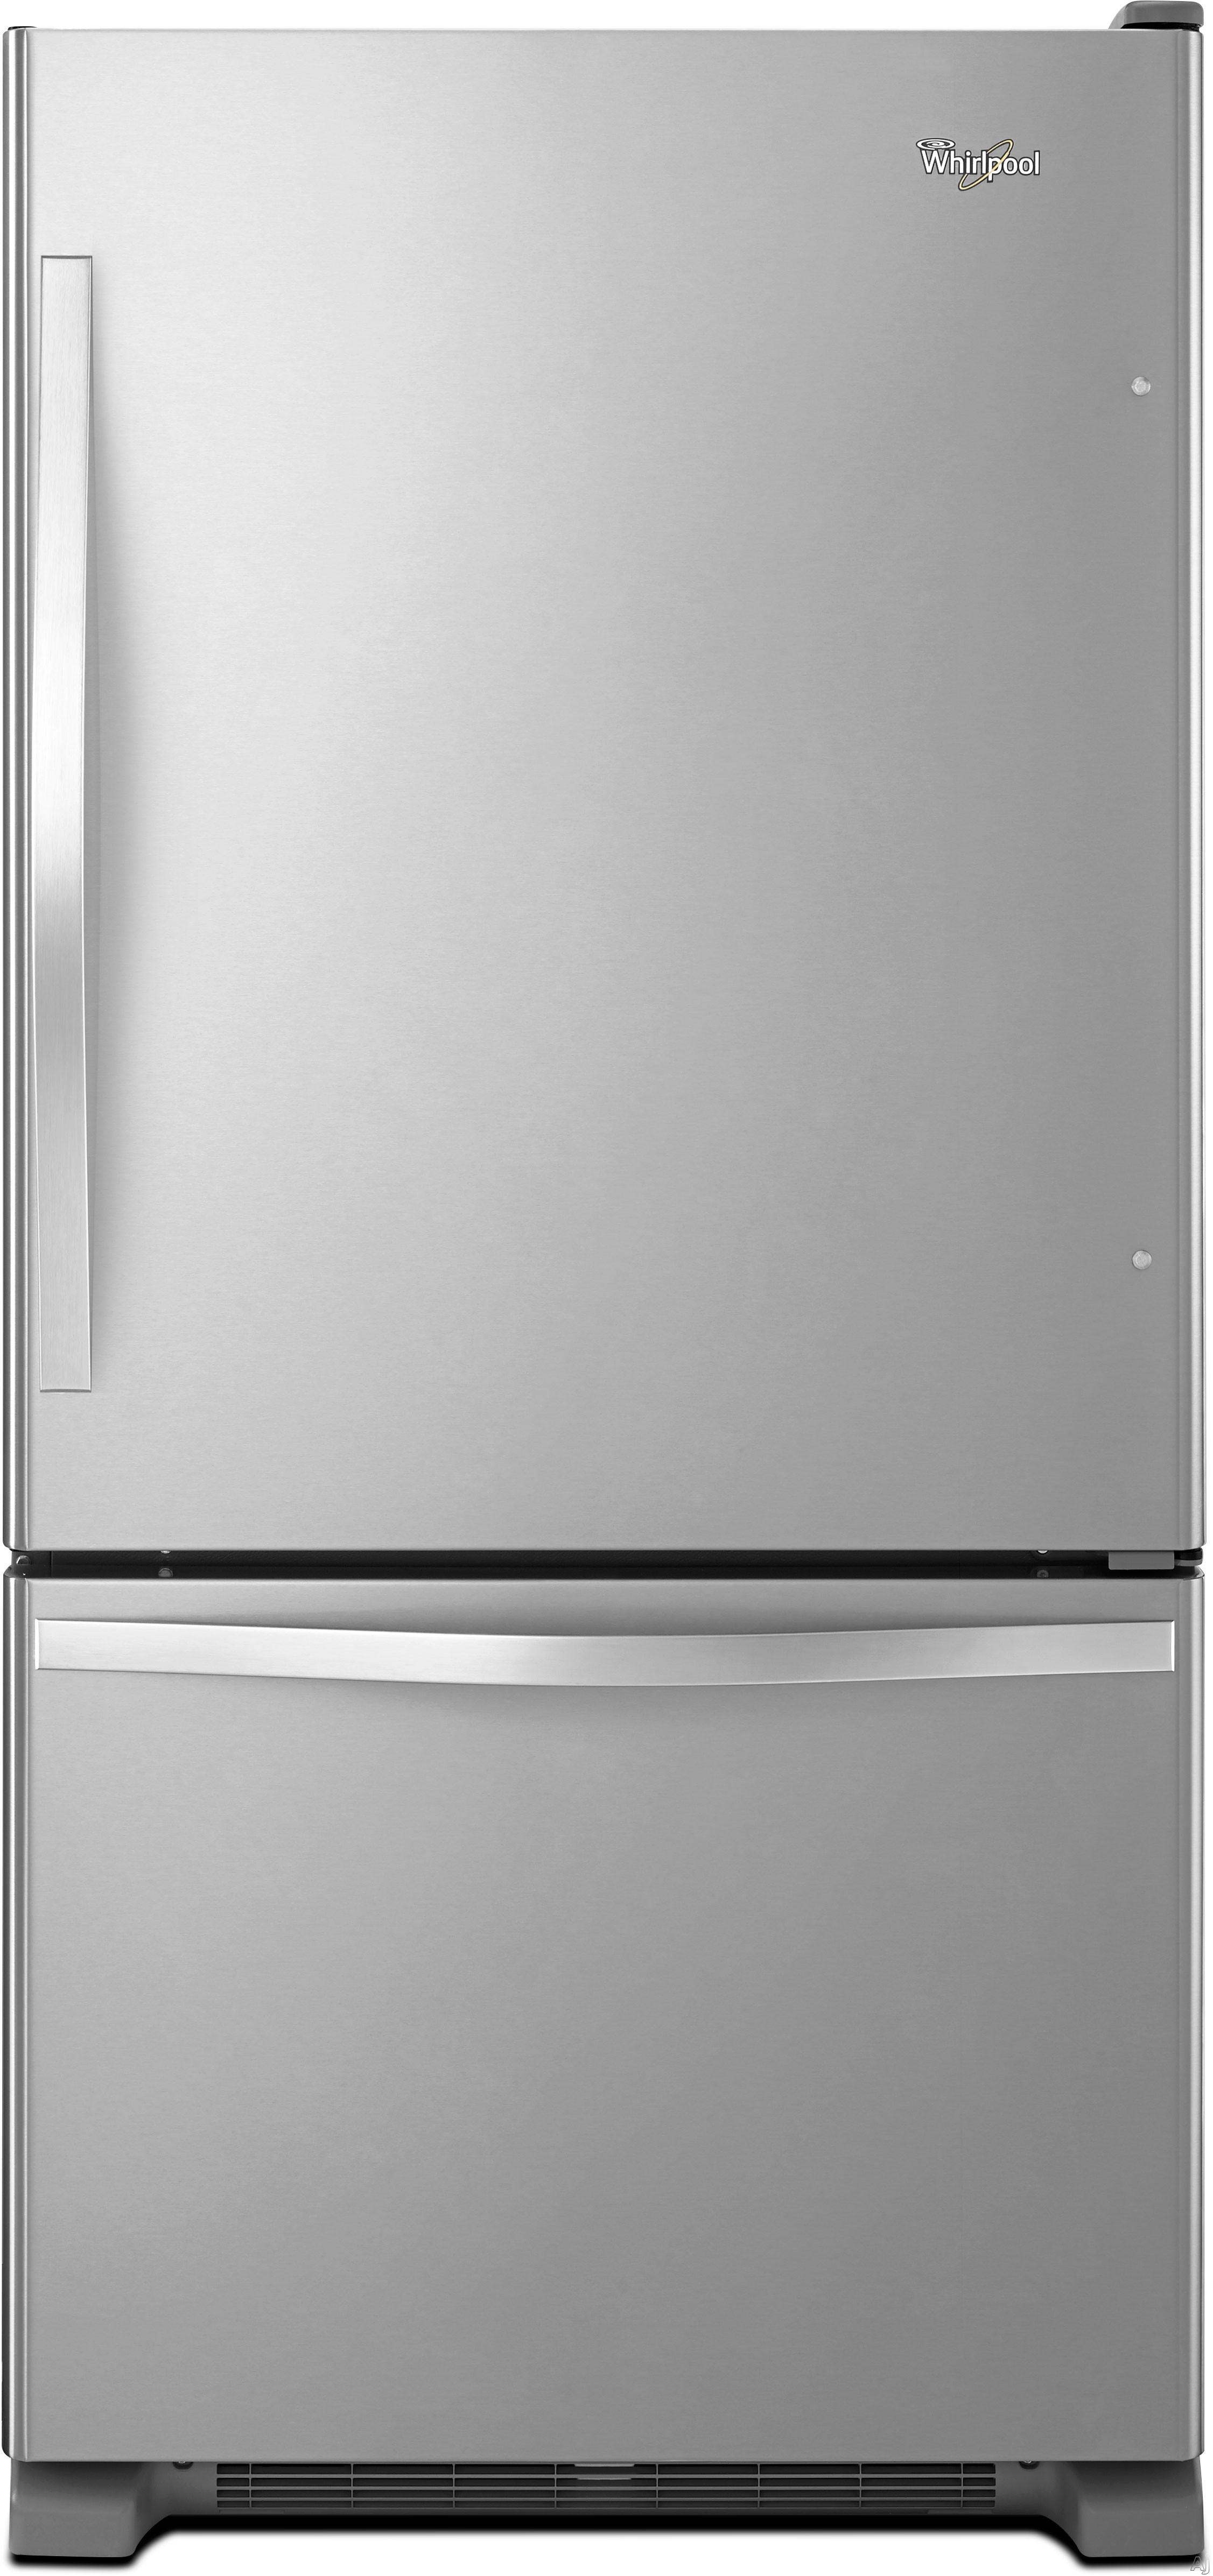 Whirlpool Wrb322dmbm 21 9 Cu Ft Bottom Freezer